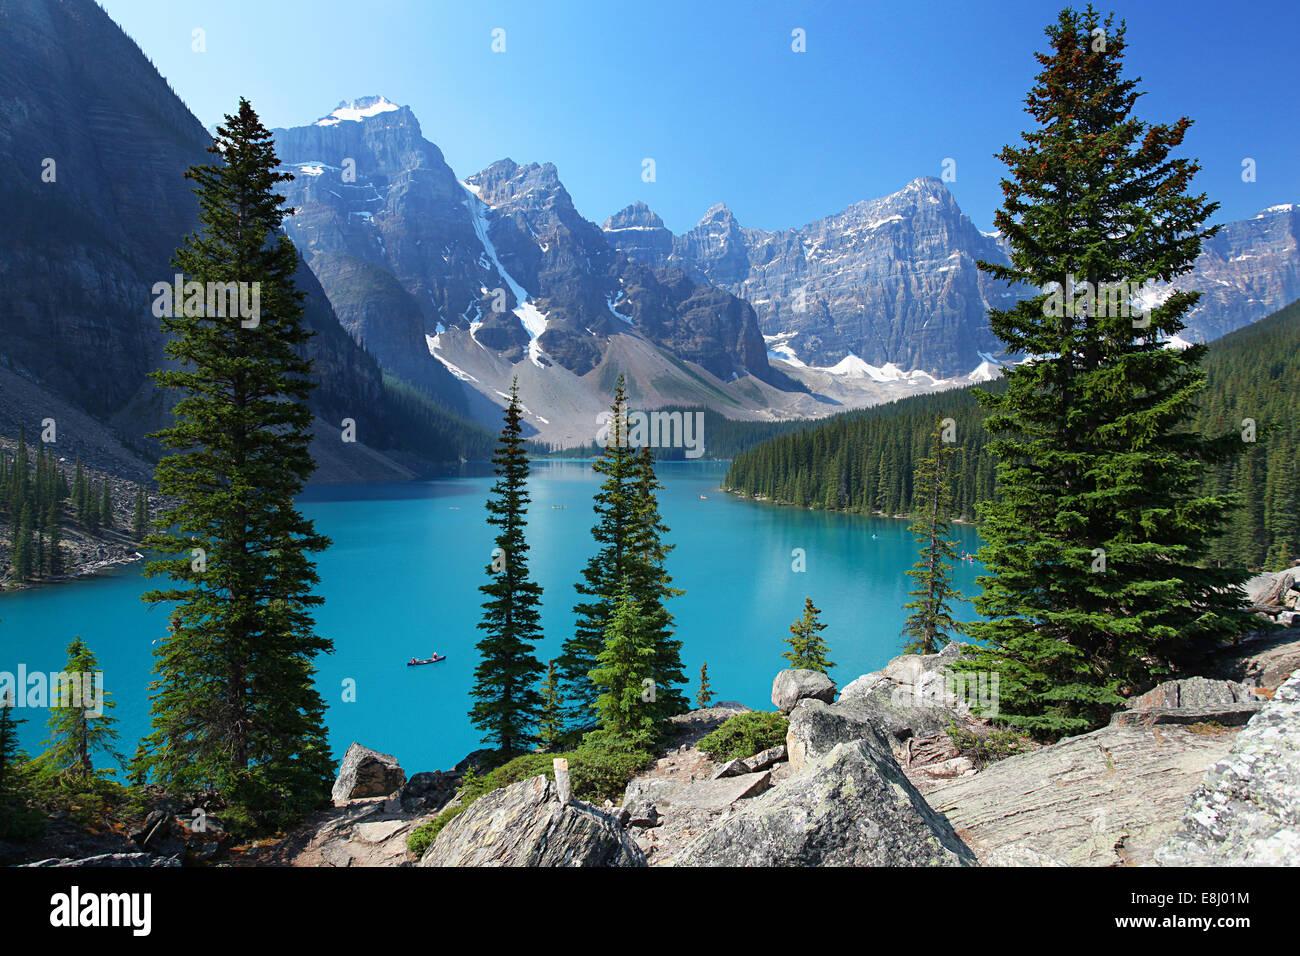 Moraine Lake in den kanadischen Rockies Stockbild